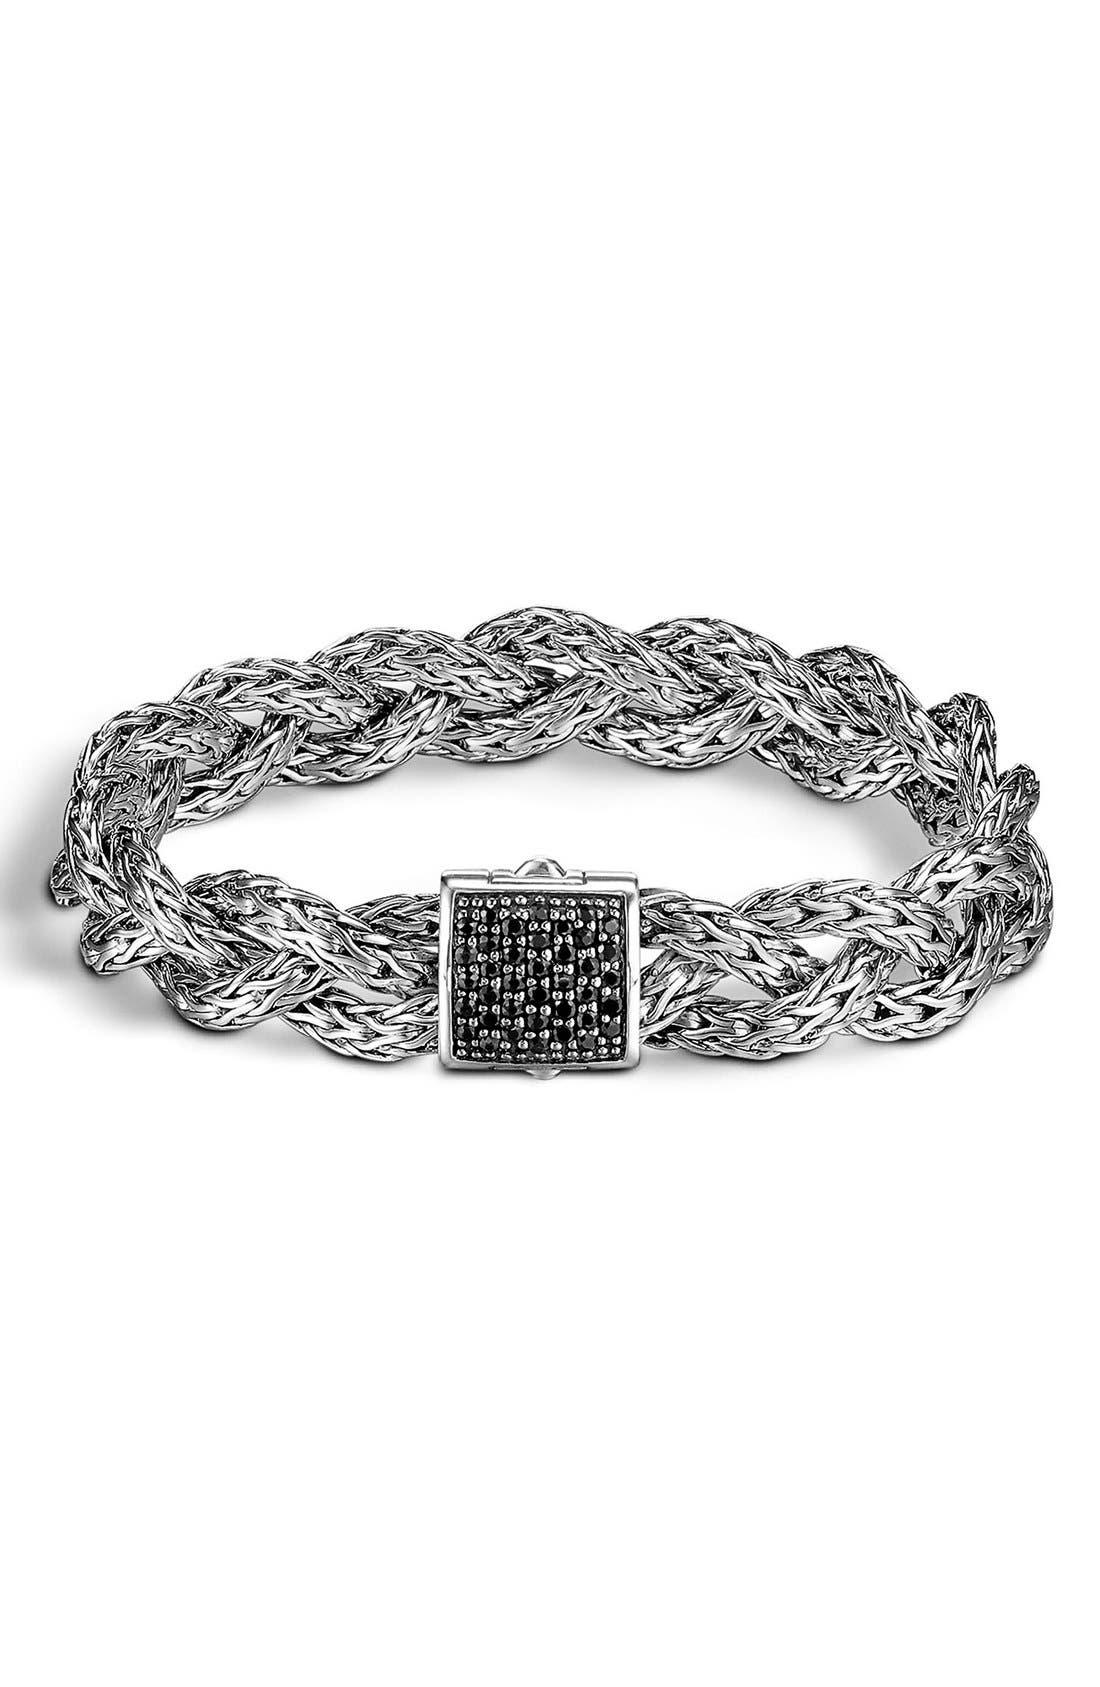 'Braided Chain' Semiprecious Stone Bracelet,                         Main,                         color, Silver/ Black Sapphire